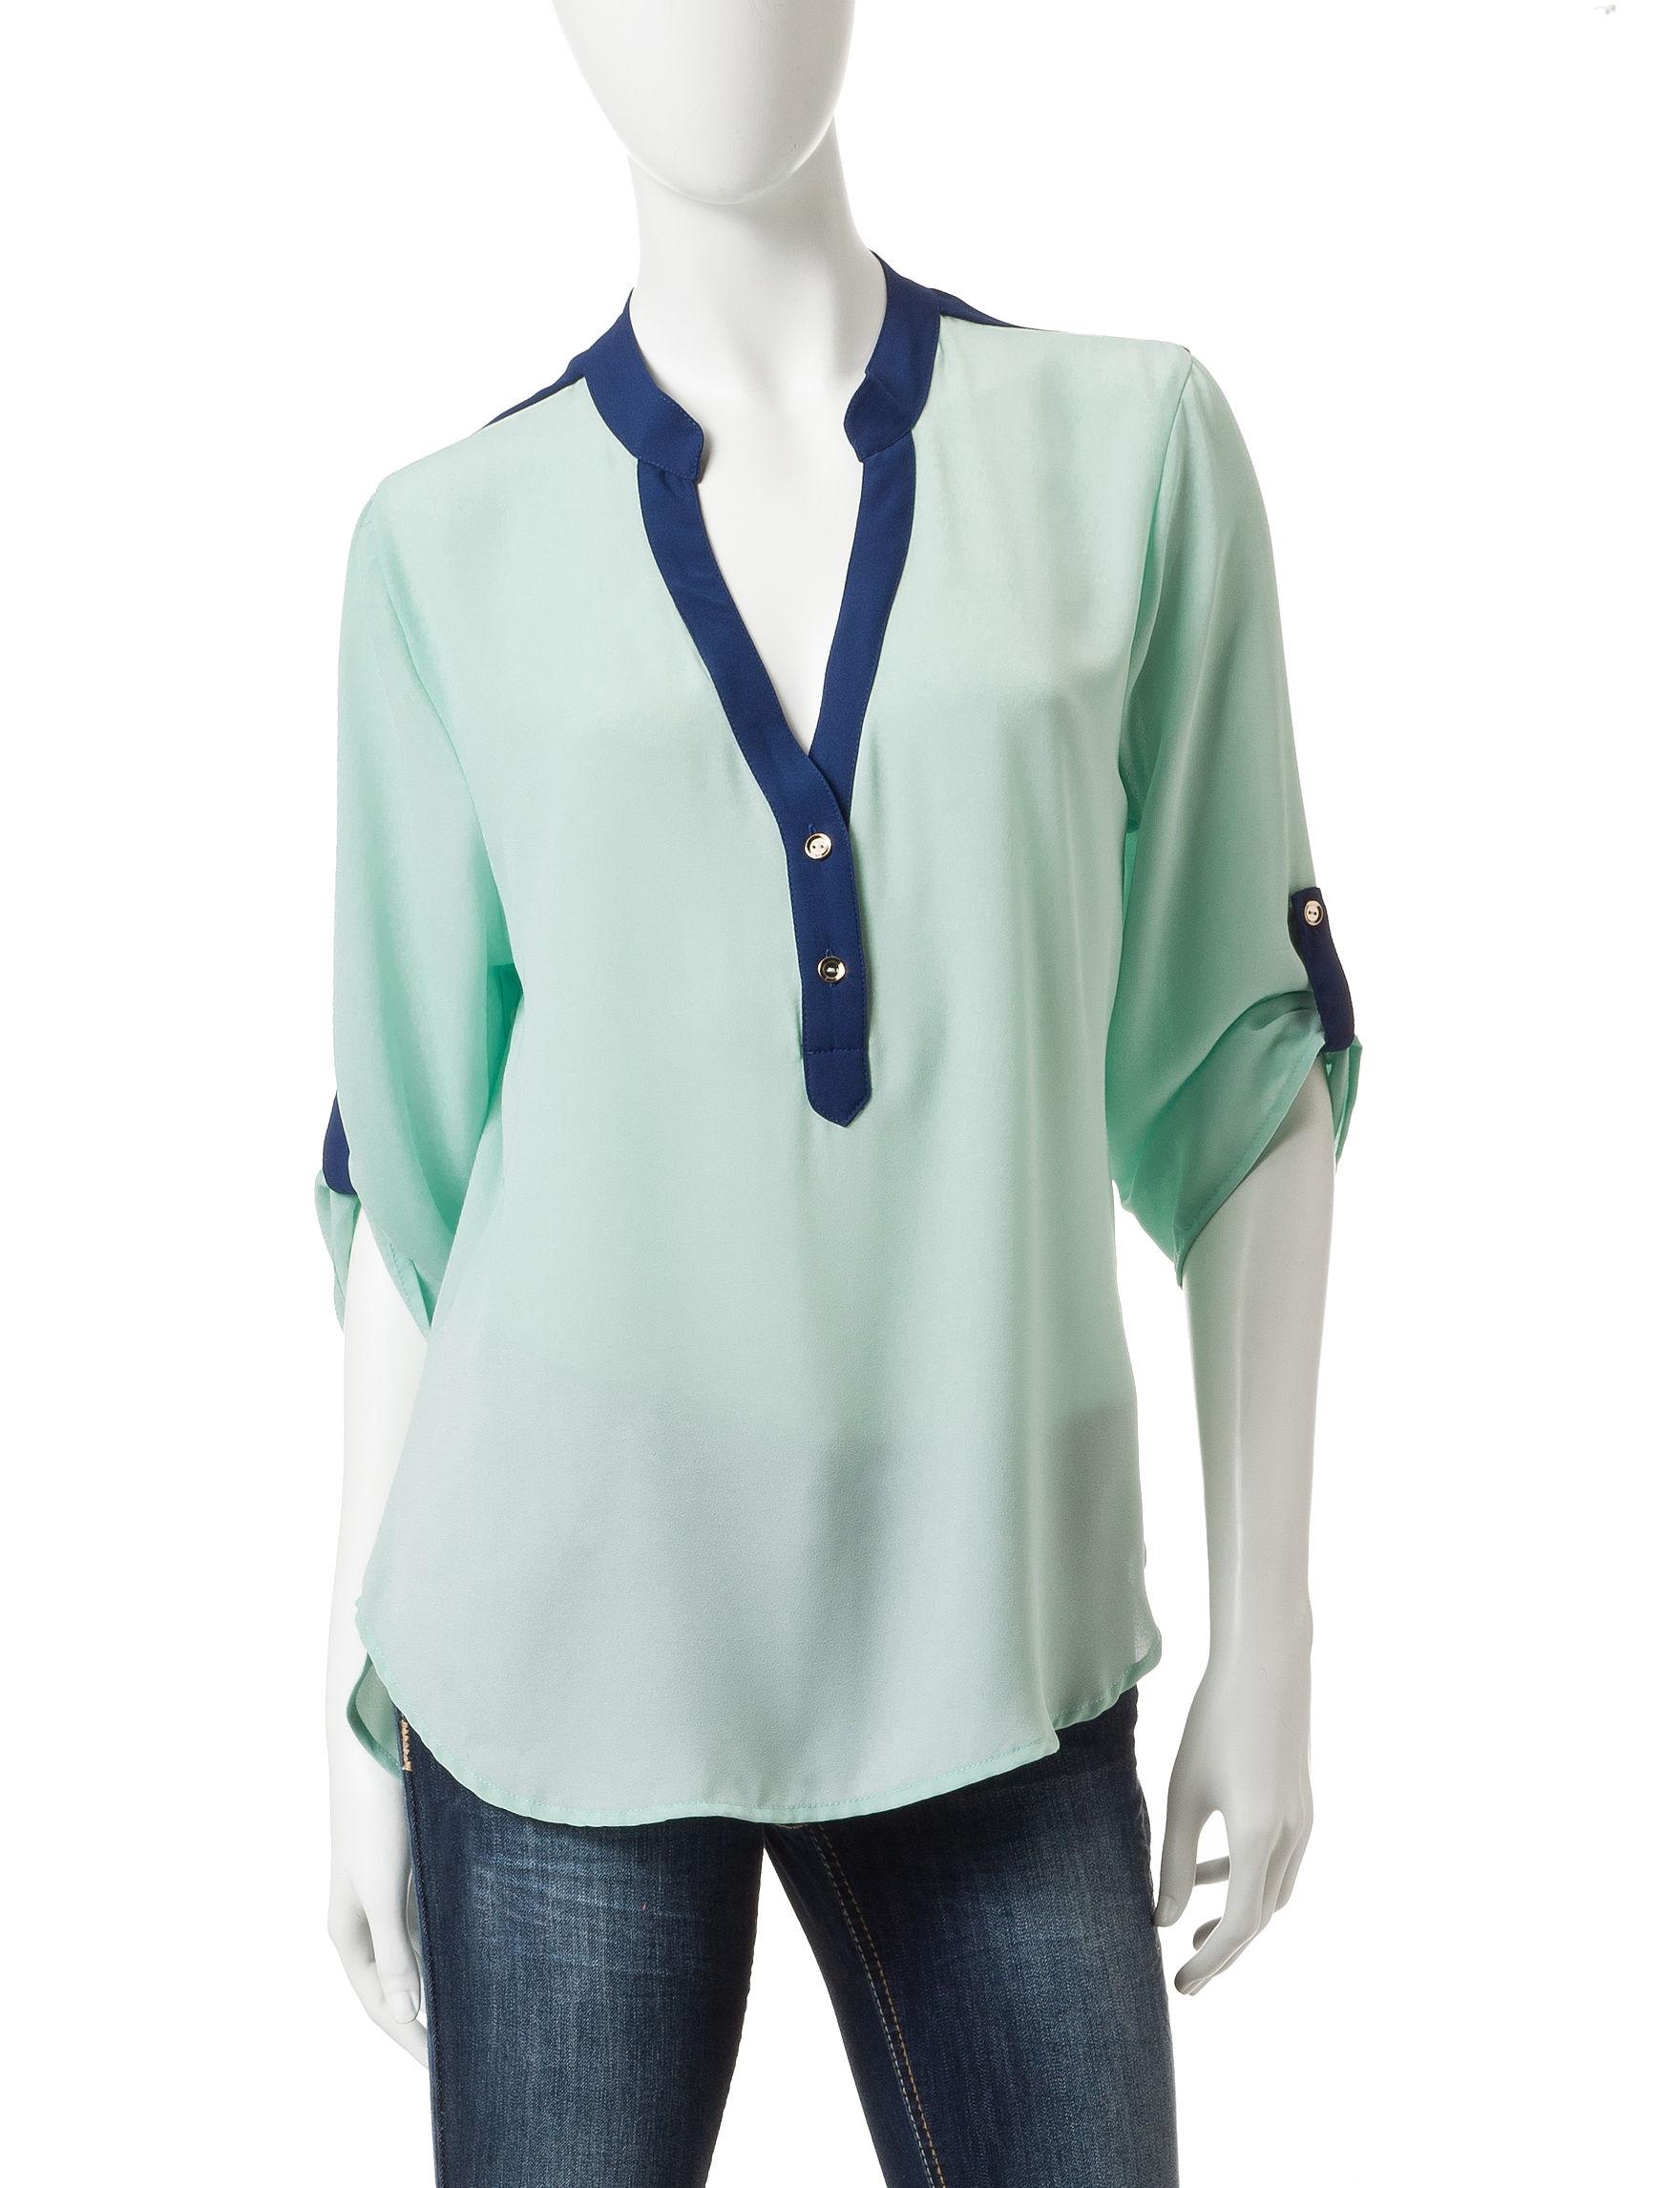 Wishful Park Navy / Multi Shirts & Blouses